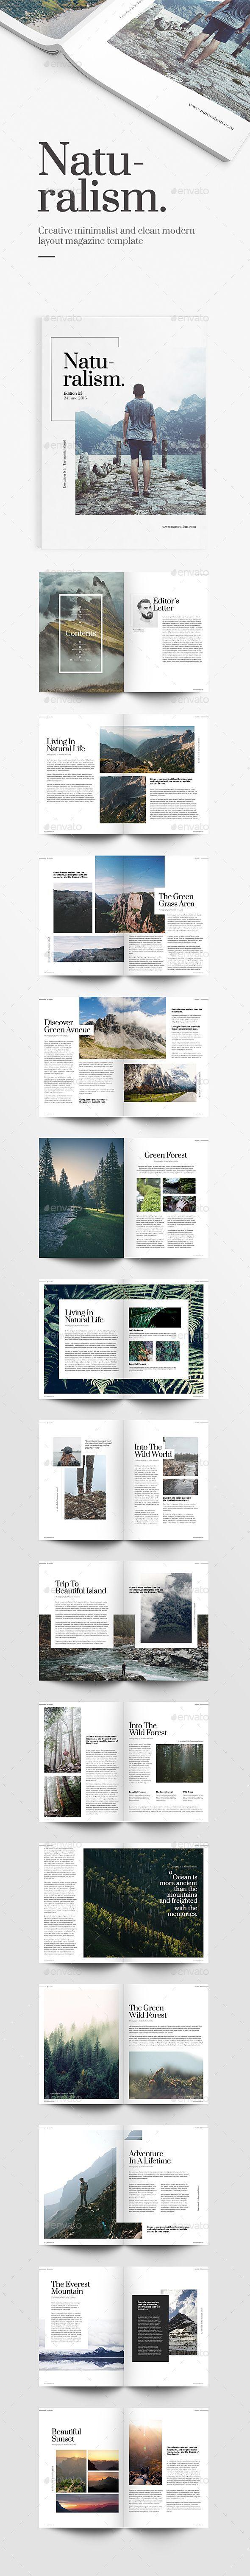 Naturalism Magazine Template InDesign INDD. Download here: https://graphicriver.net/item/naturalism-magazine-/17277074?ref=ksioks